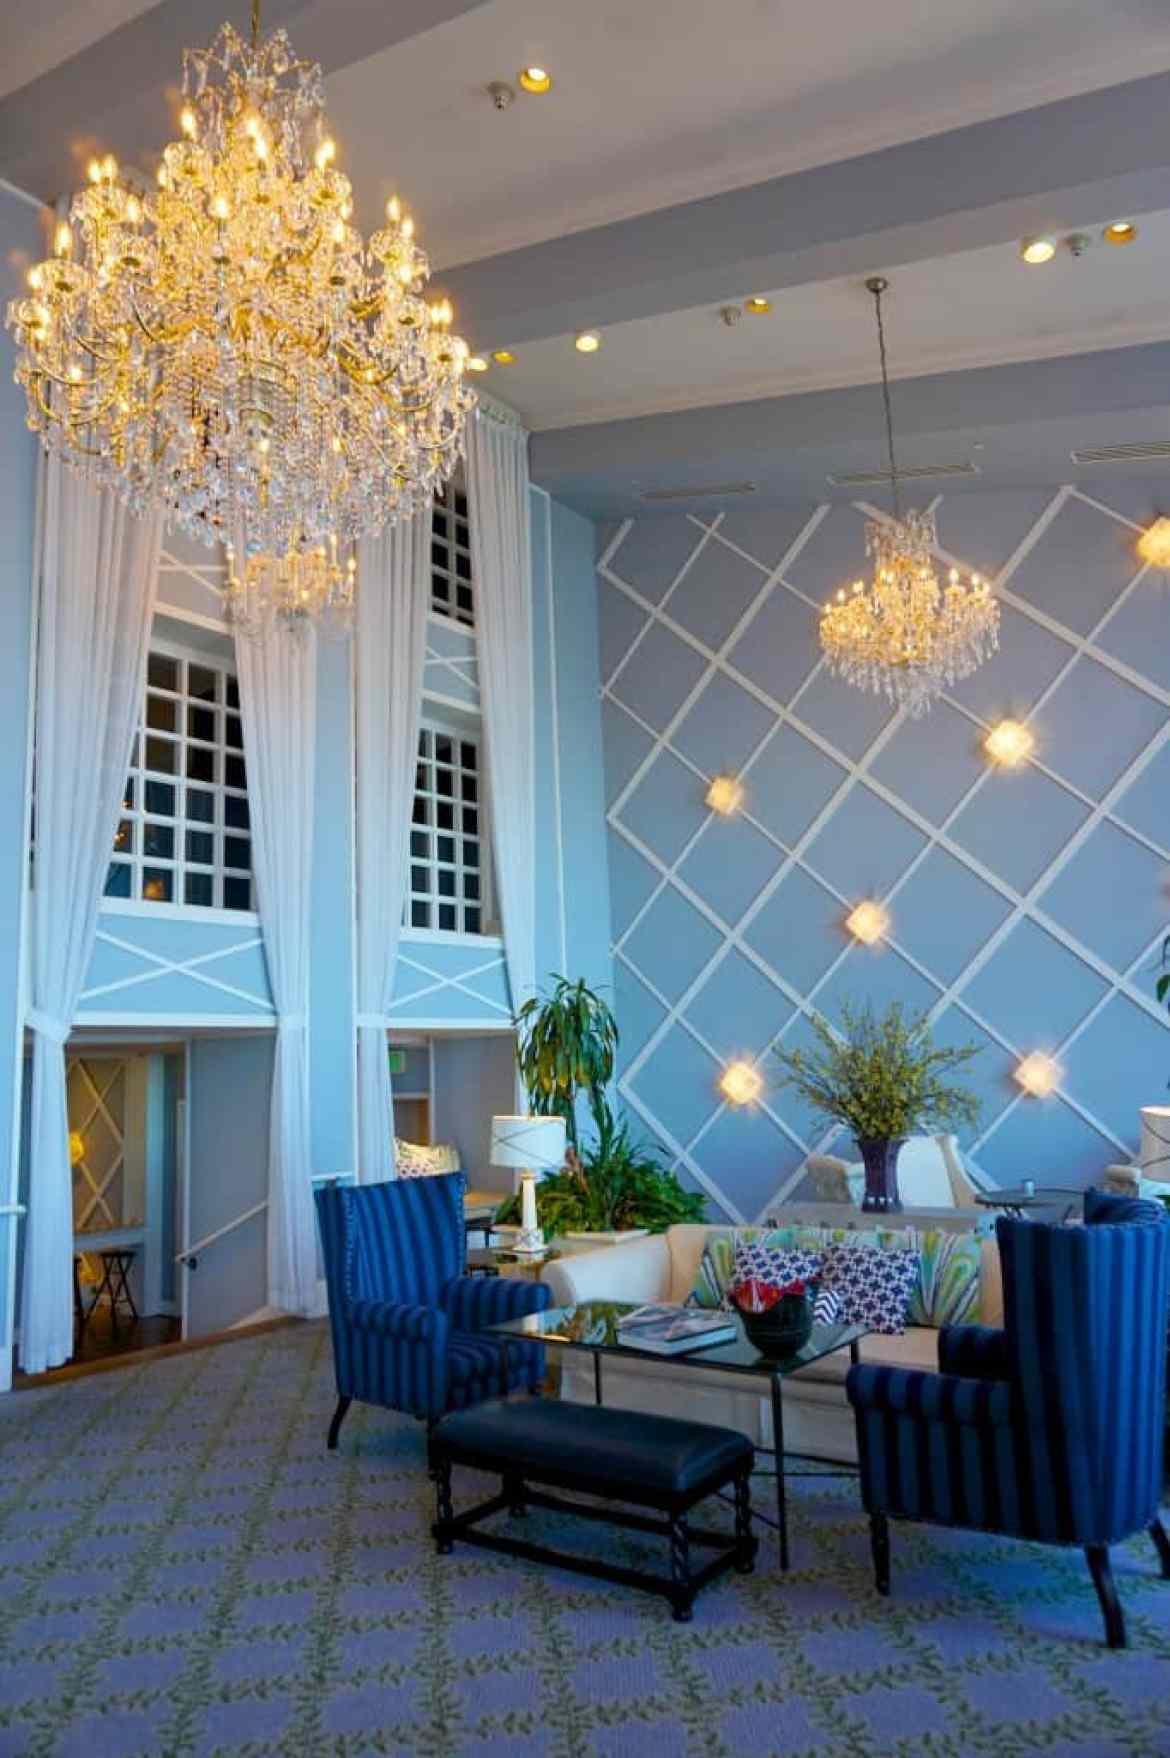 The Portofino Hotel's Living Room